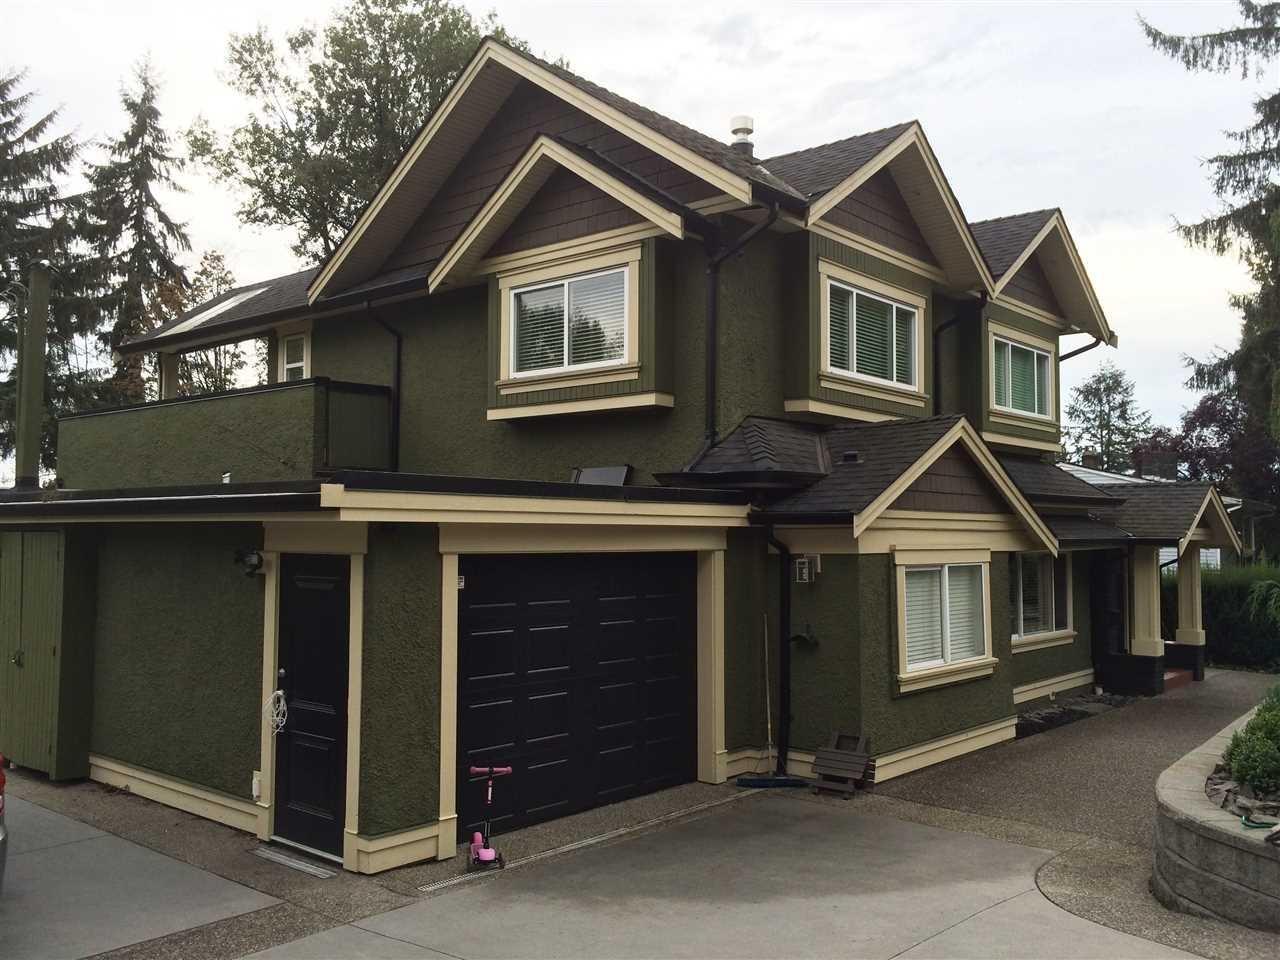 R2107185 - 1239 SHAVINGTON STREET, Calverhall, North Vancouver, BC - House/Single Family